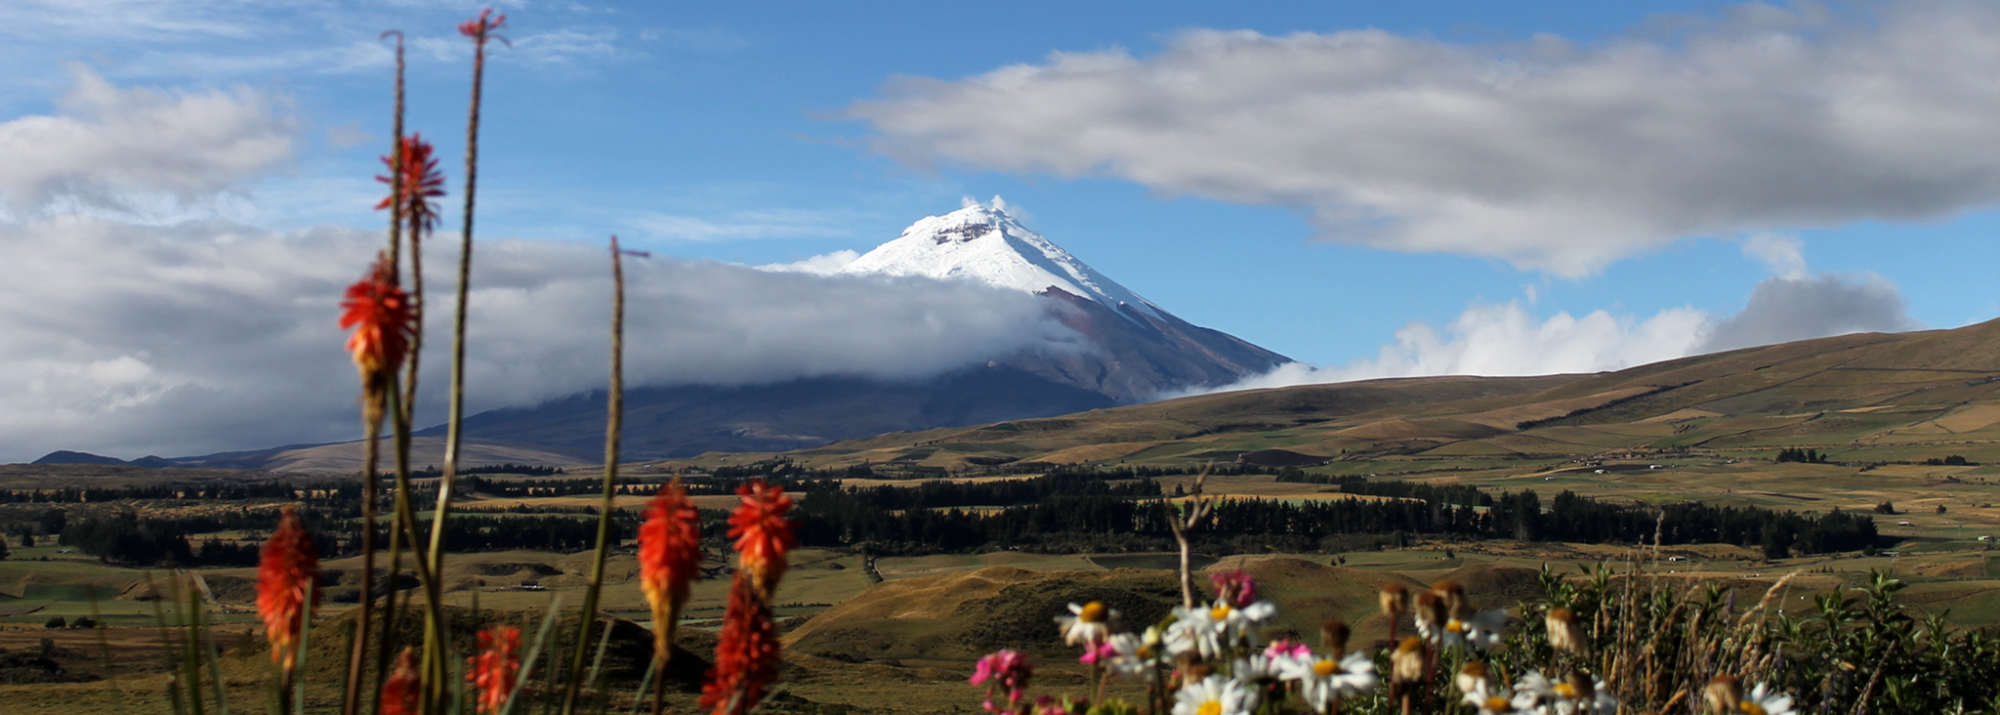 Ecuador: Blick auf den Vulkan Cotopaxi und den gleichnamigen Nationalpark